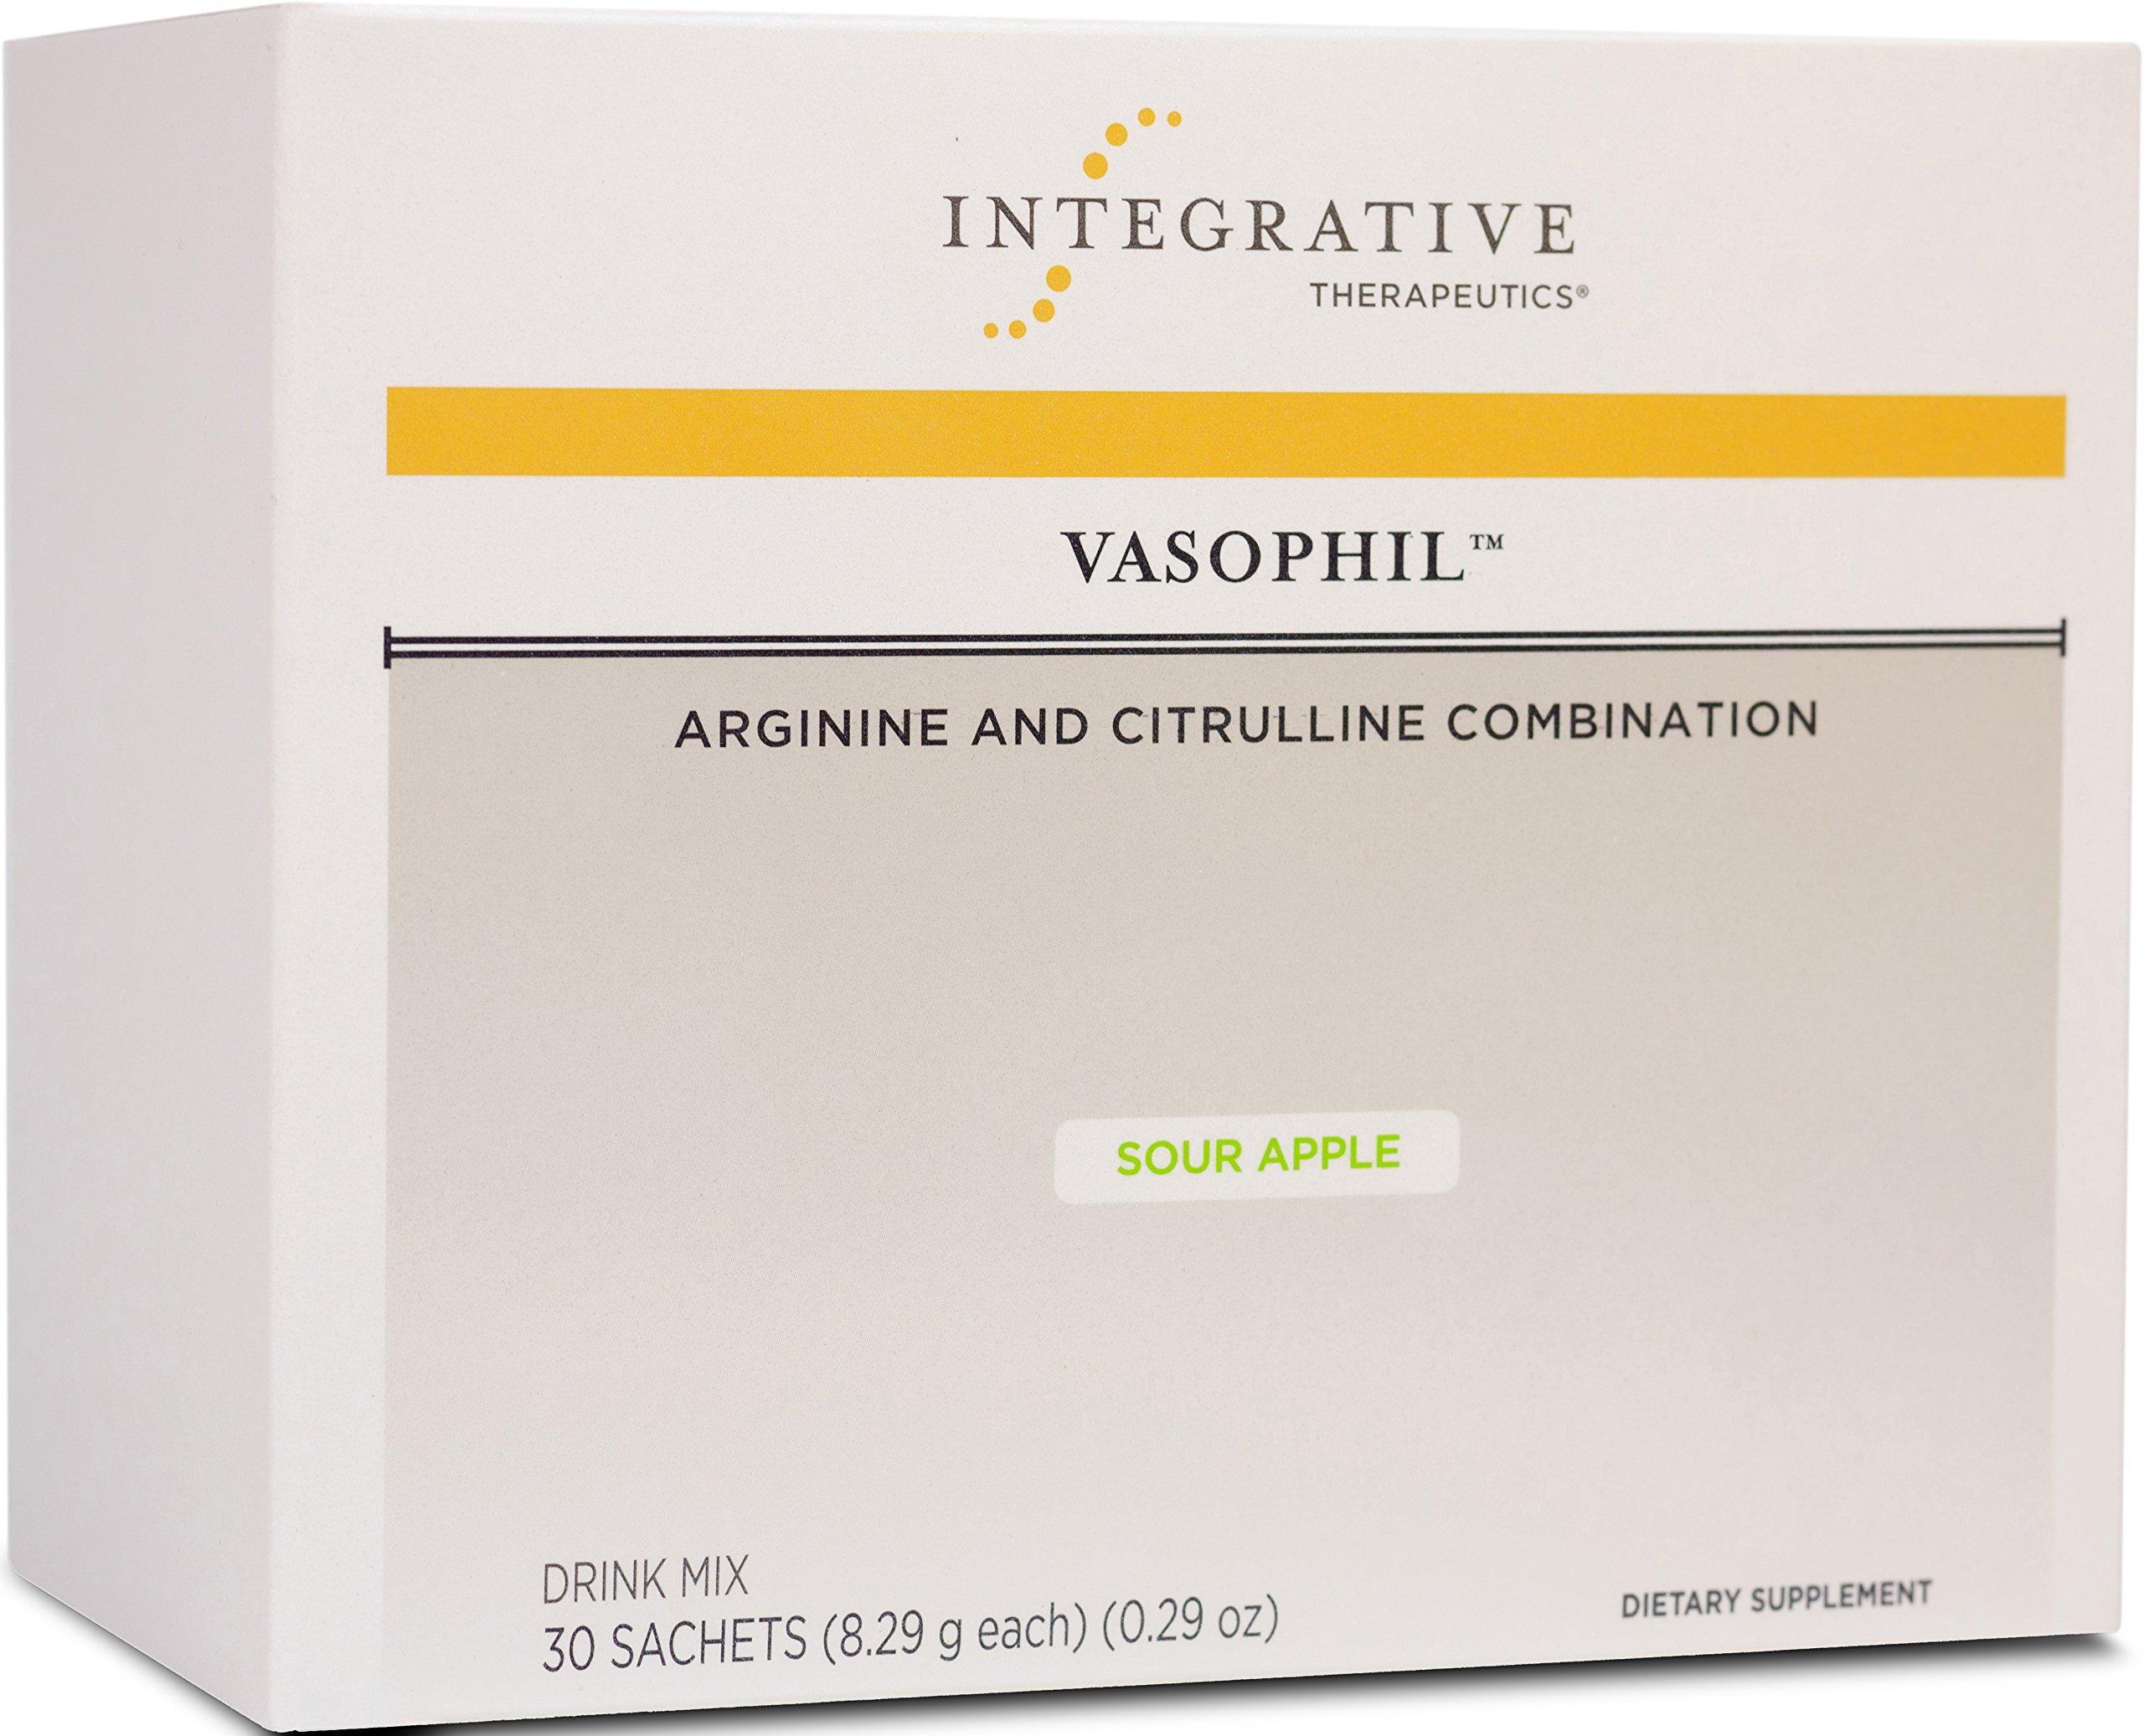 Integrative Therapeutics - Vasophil Drink Mix - Arginine and Citrulline Combination - Support Cardiovascular, Vasodialation, Blood Flow, & Sexual Function - Sour Apple Flavor - 30 Sachets